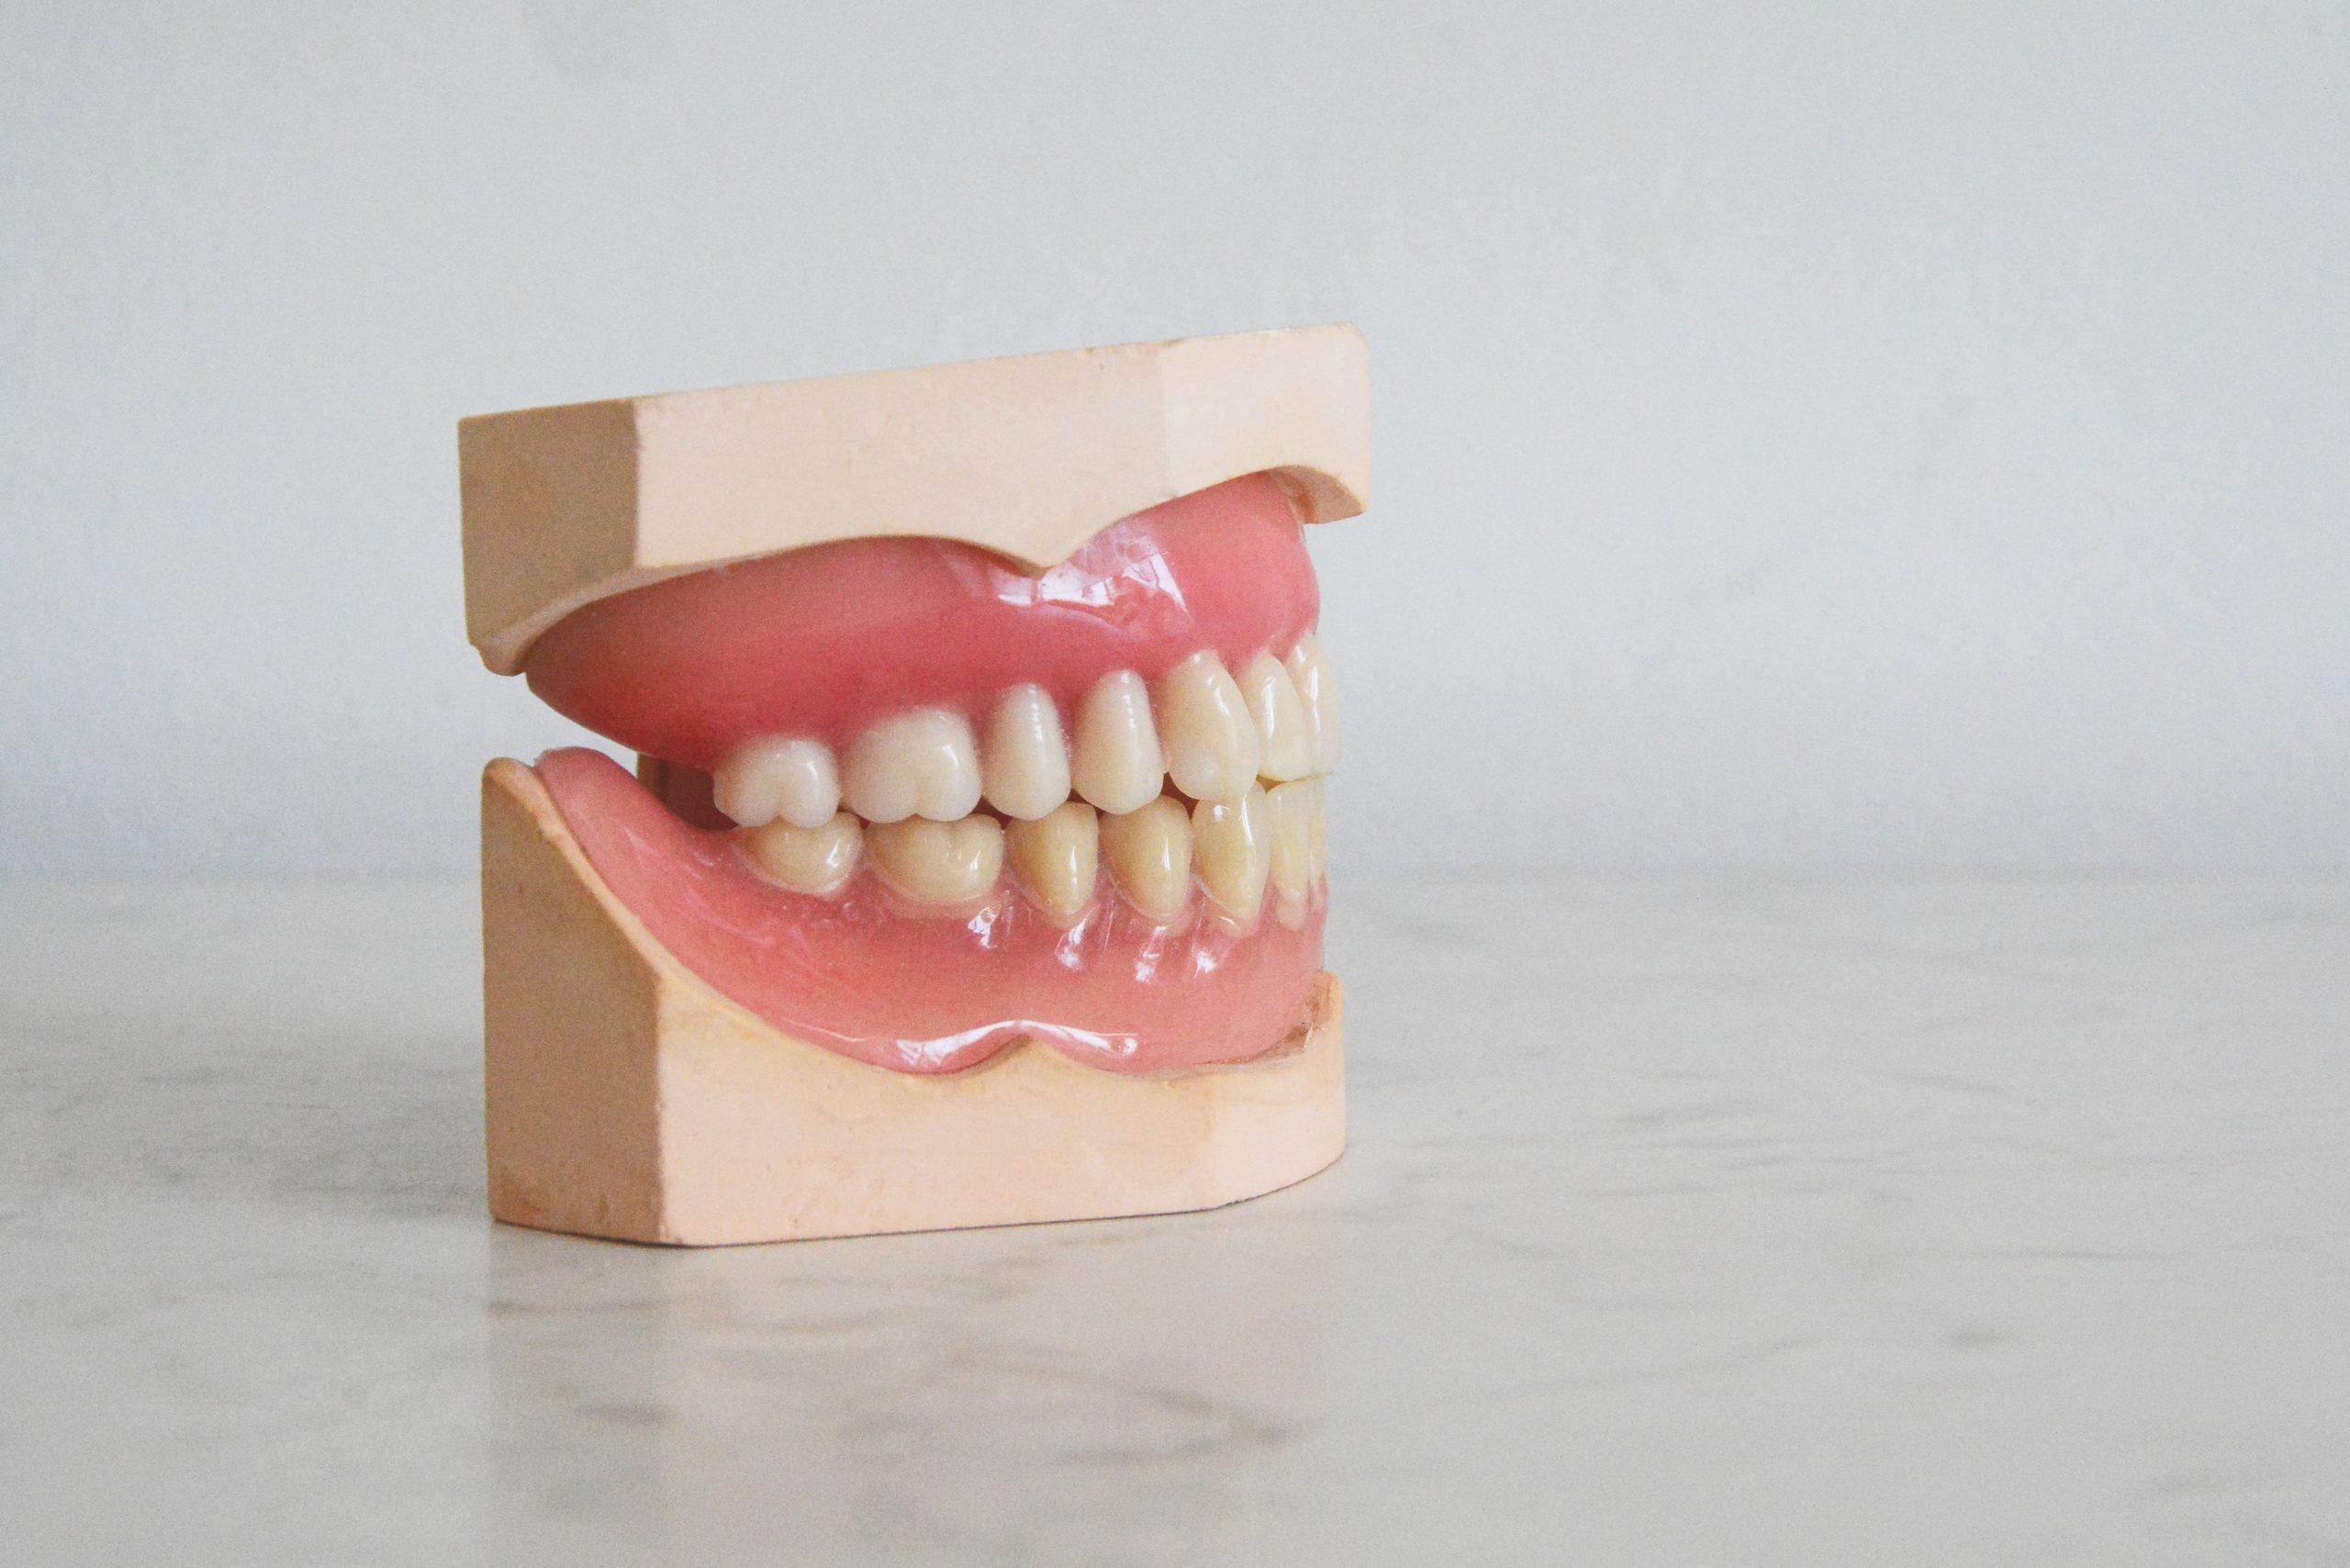 Eliminate plaque & mouth bacteria - local Colorado Springs, CO dentist